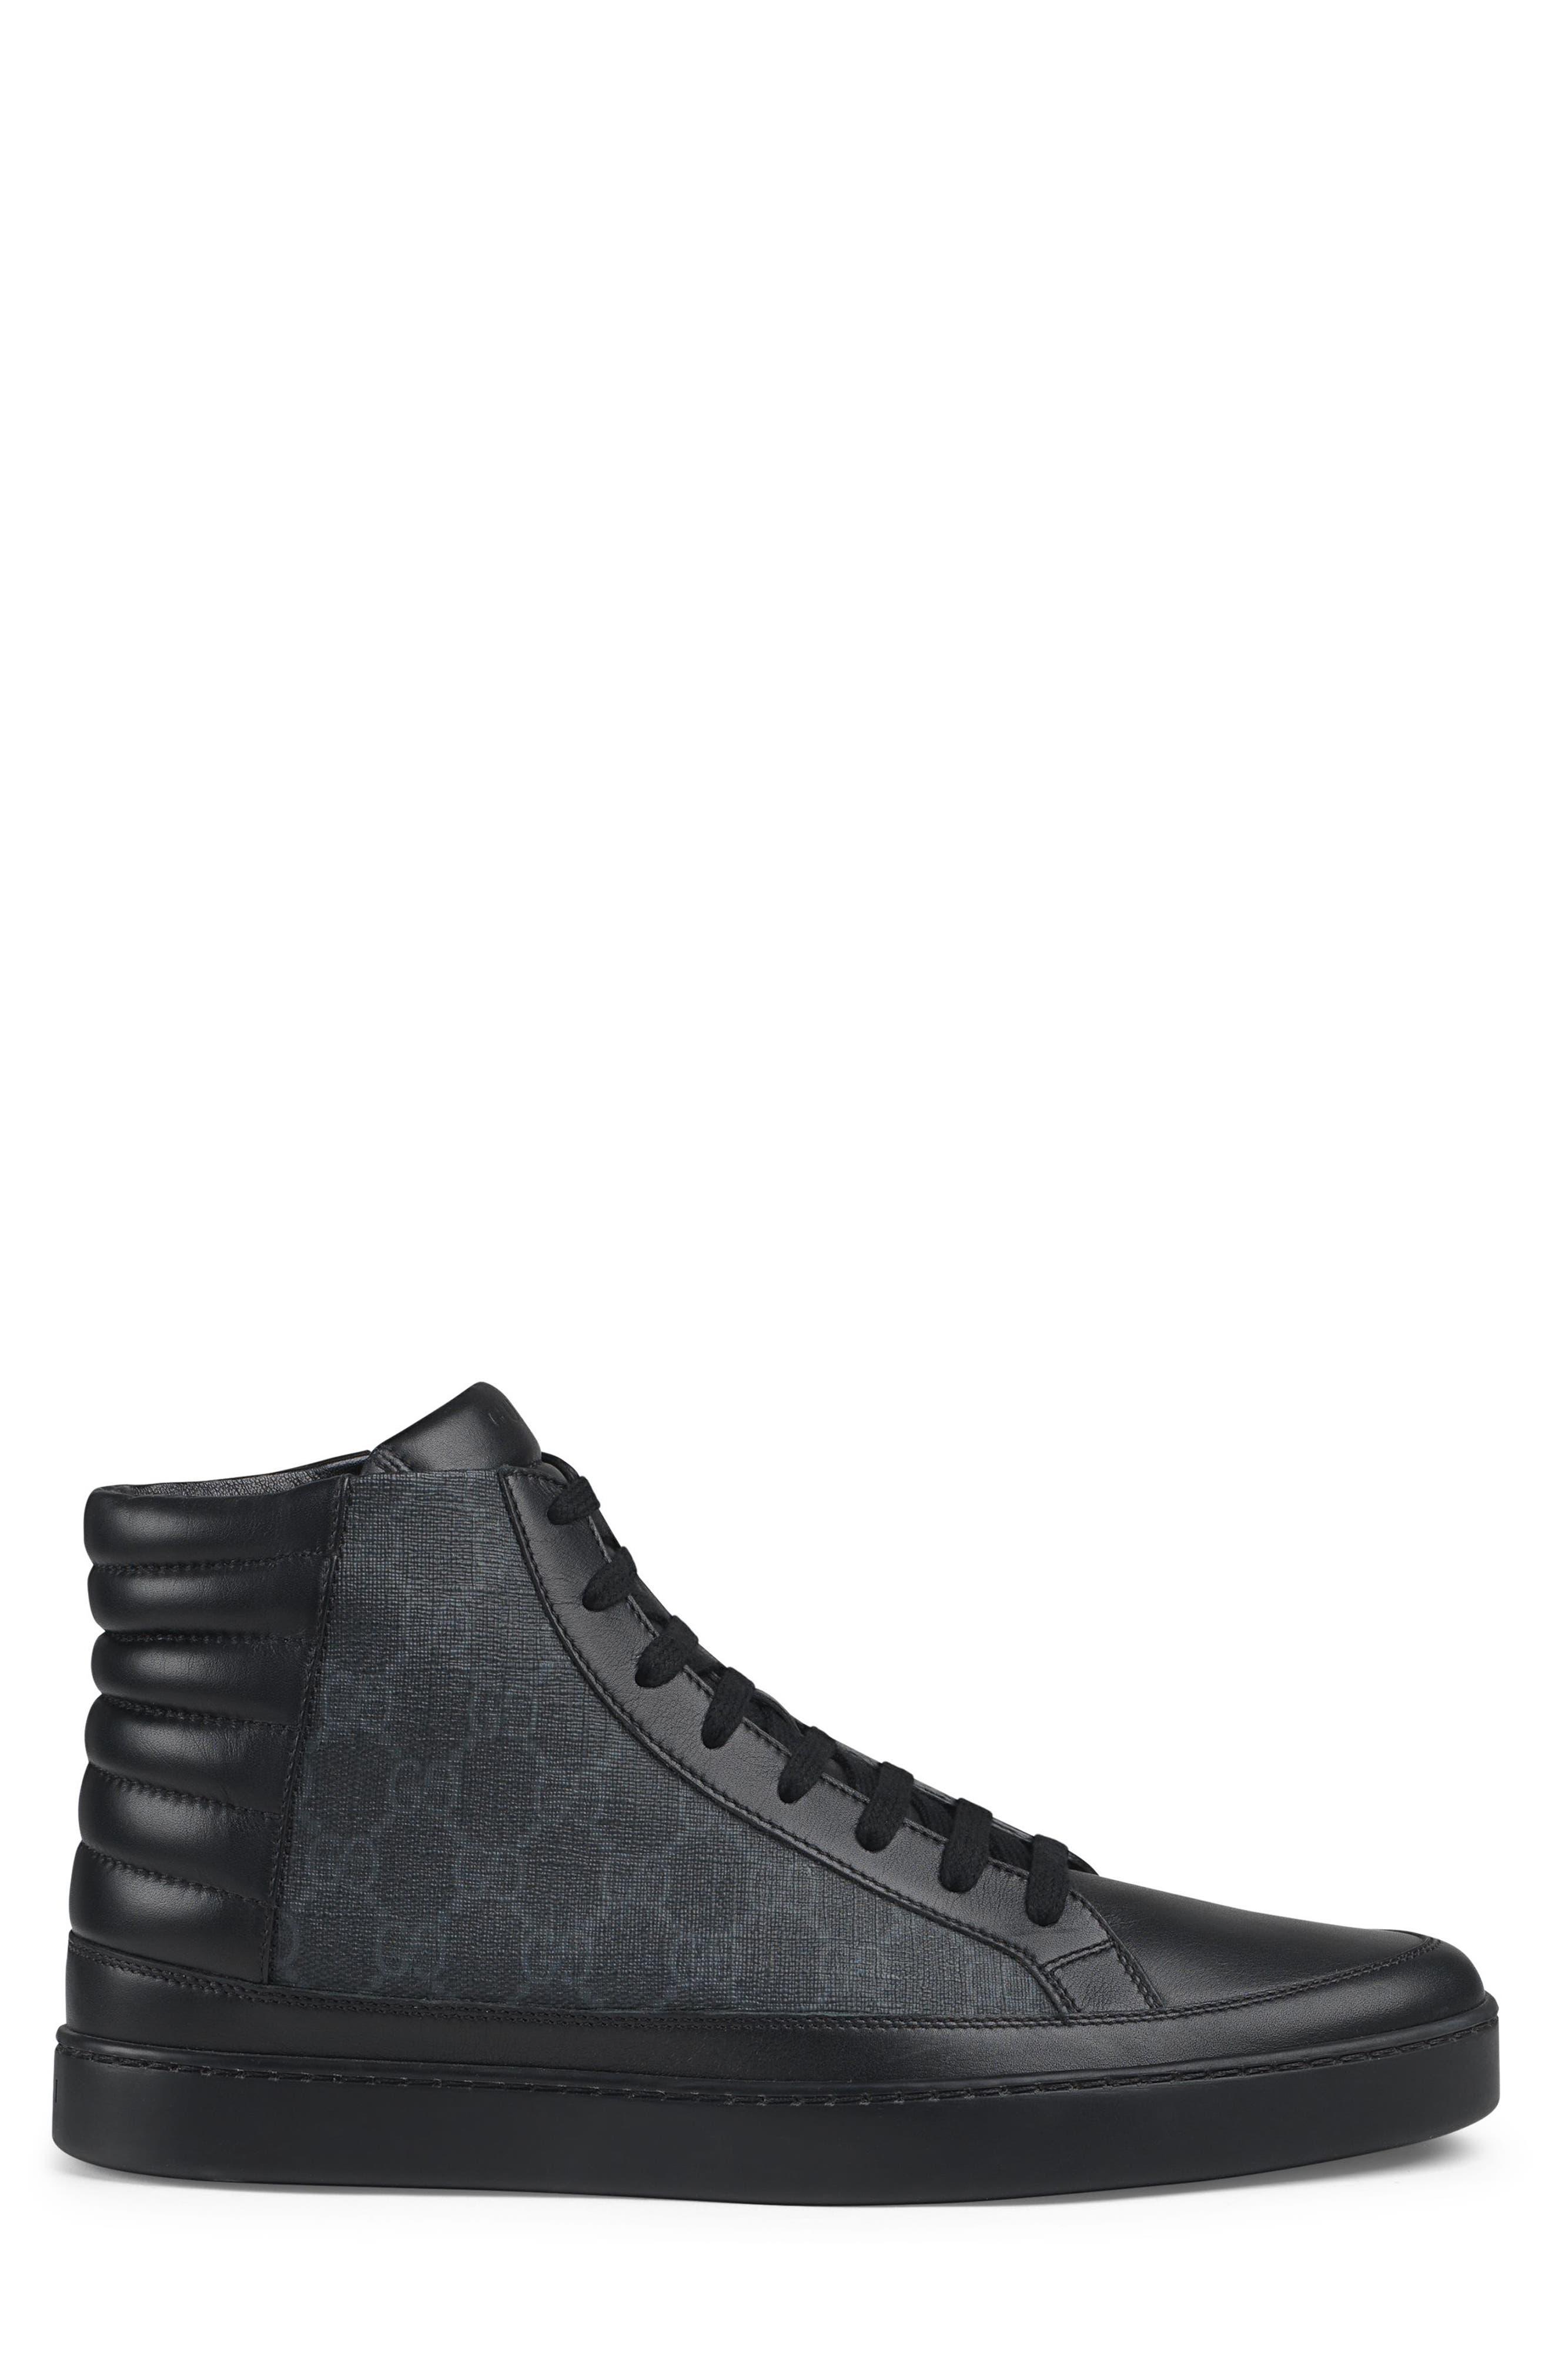 'Common' High Top Sneaker,                             Alternate thumbnail 2, color,                             002